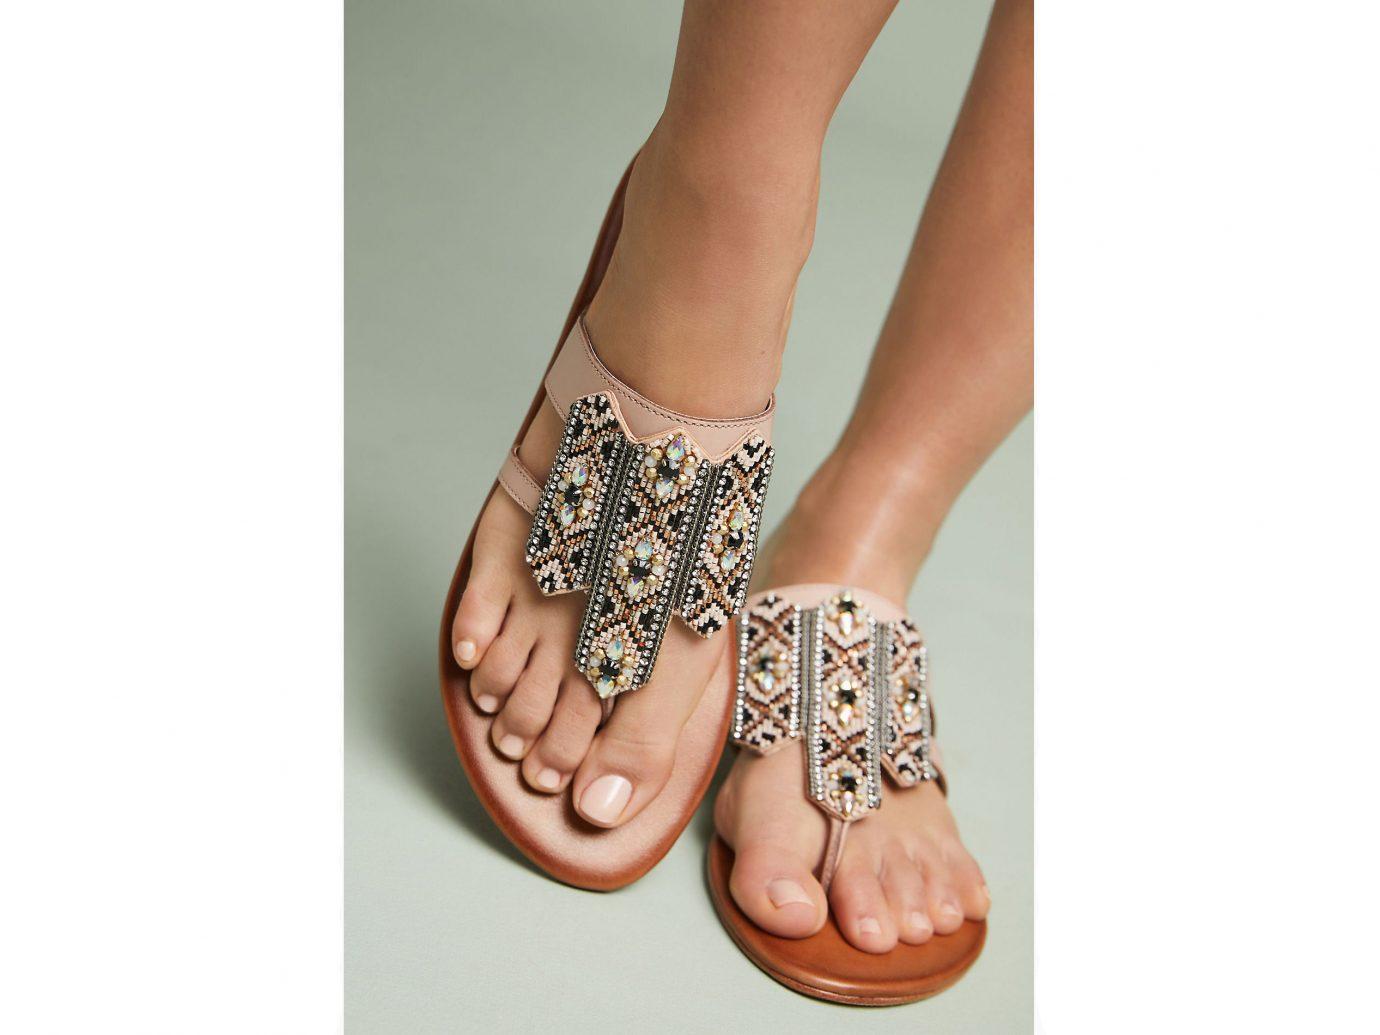 Trip Ideas footwear person clothing shoe sandal jewellery nail finger hand human leg toe ankle product high heeled footwear foot beautiful